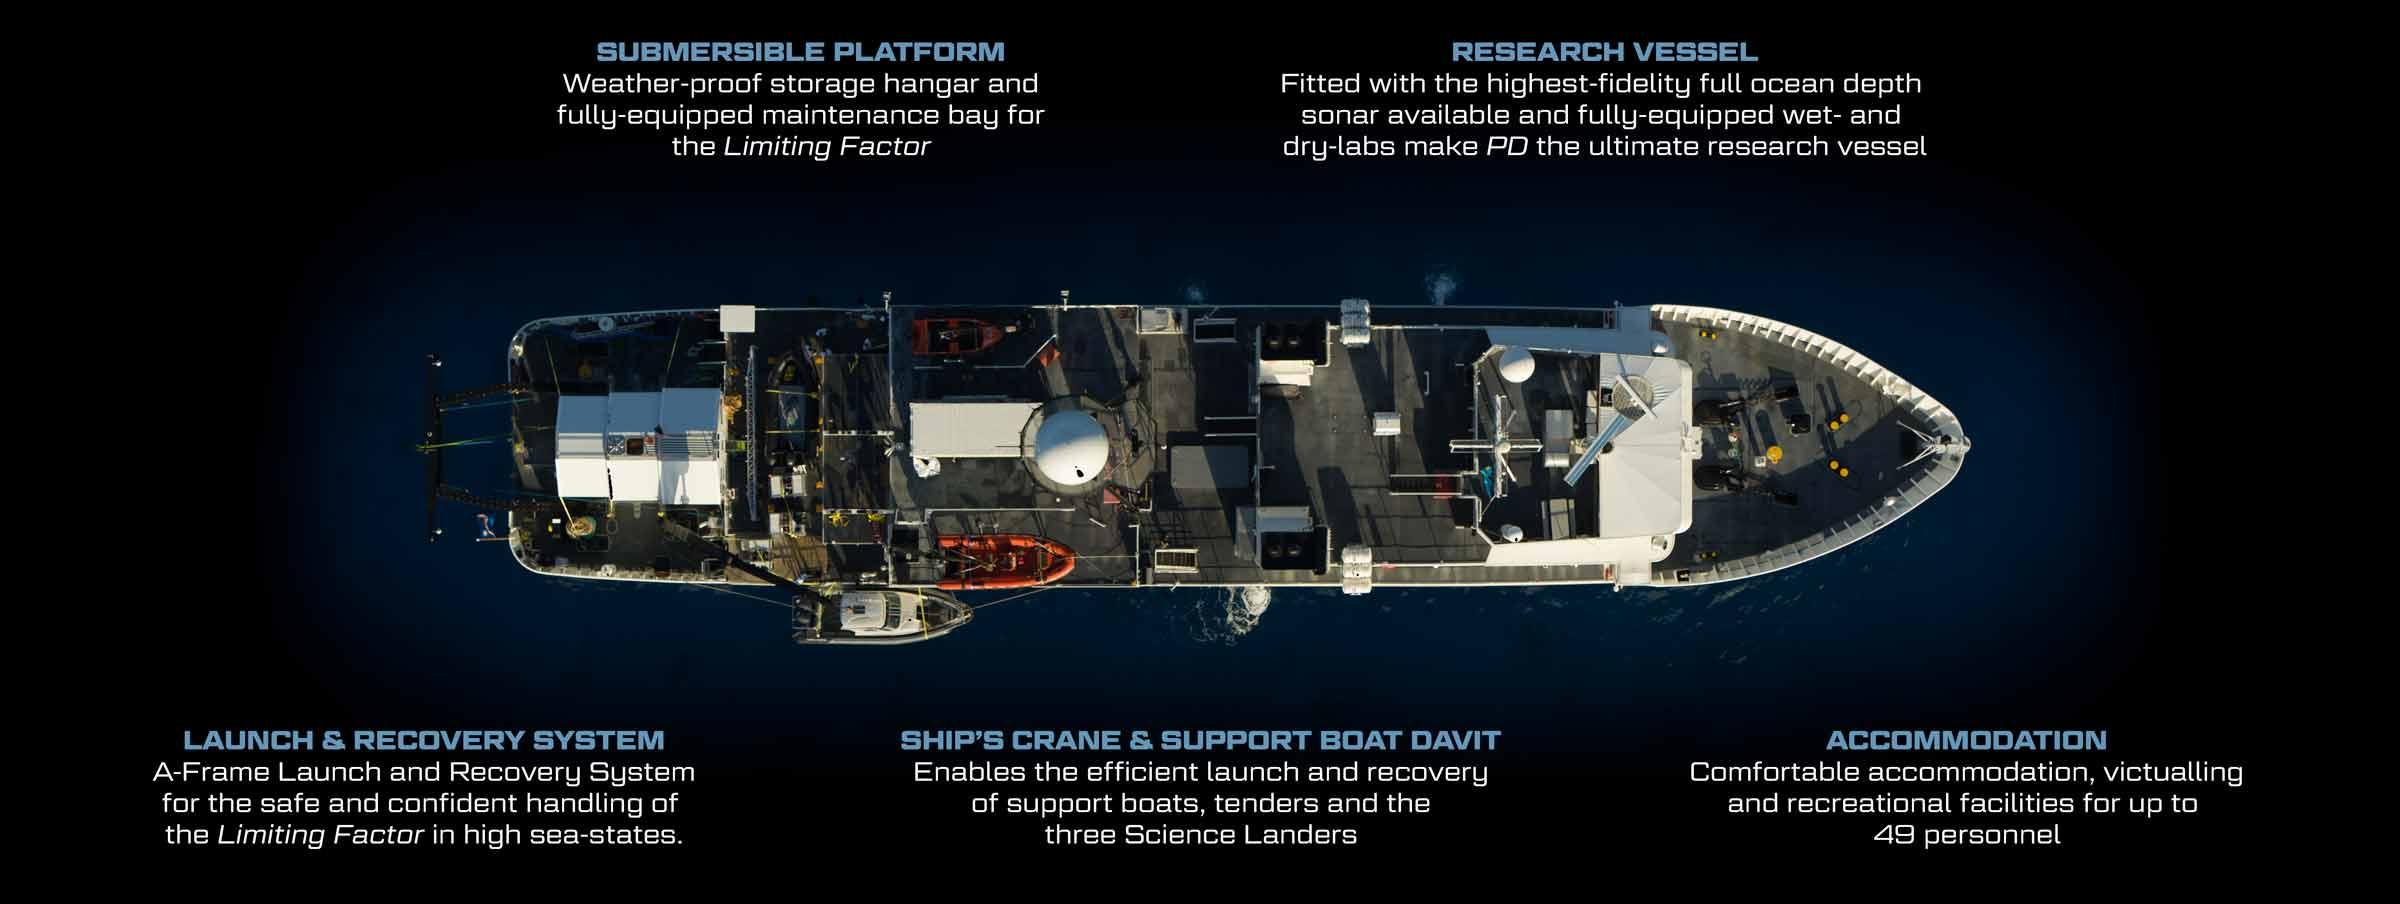 Vessel | Five Deeps Expedition